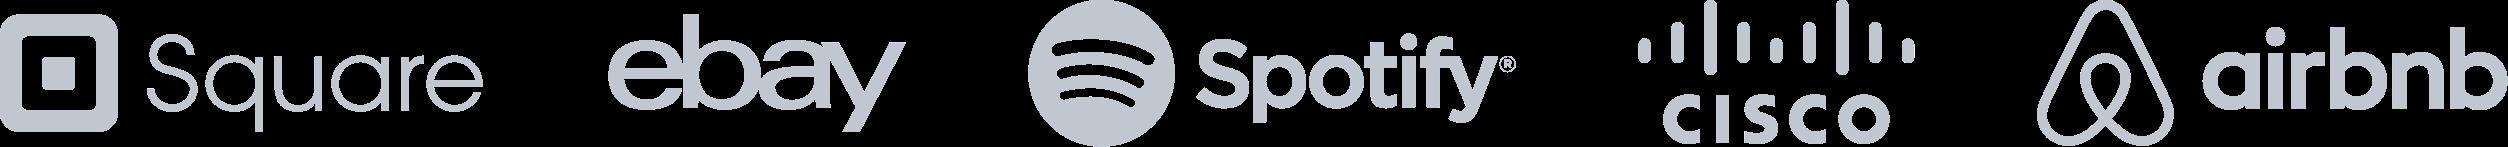 Atlassian Partnerek